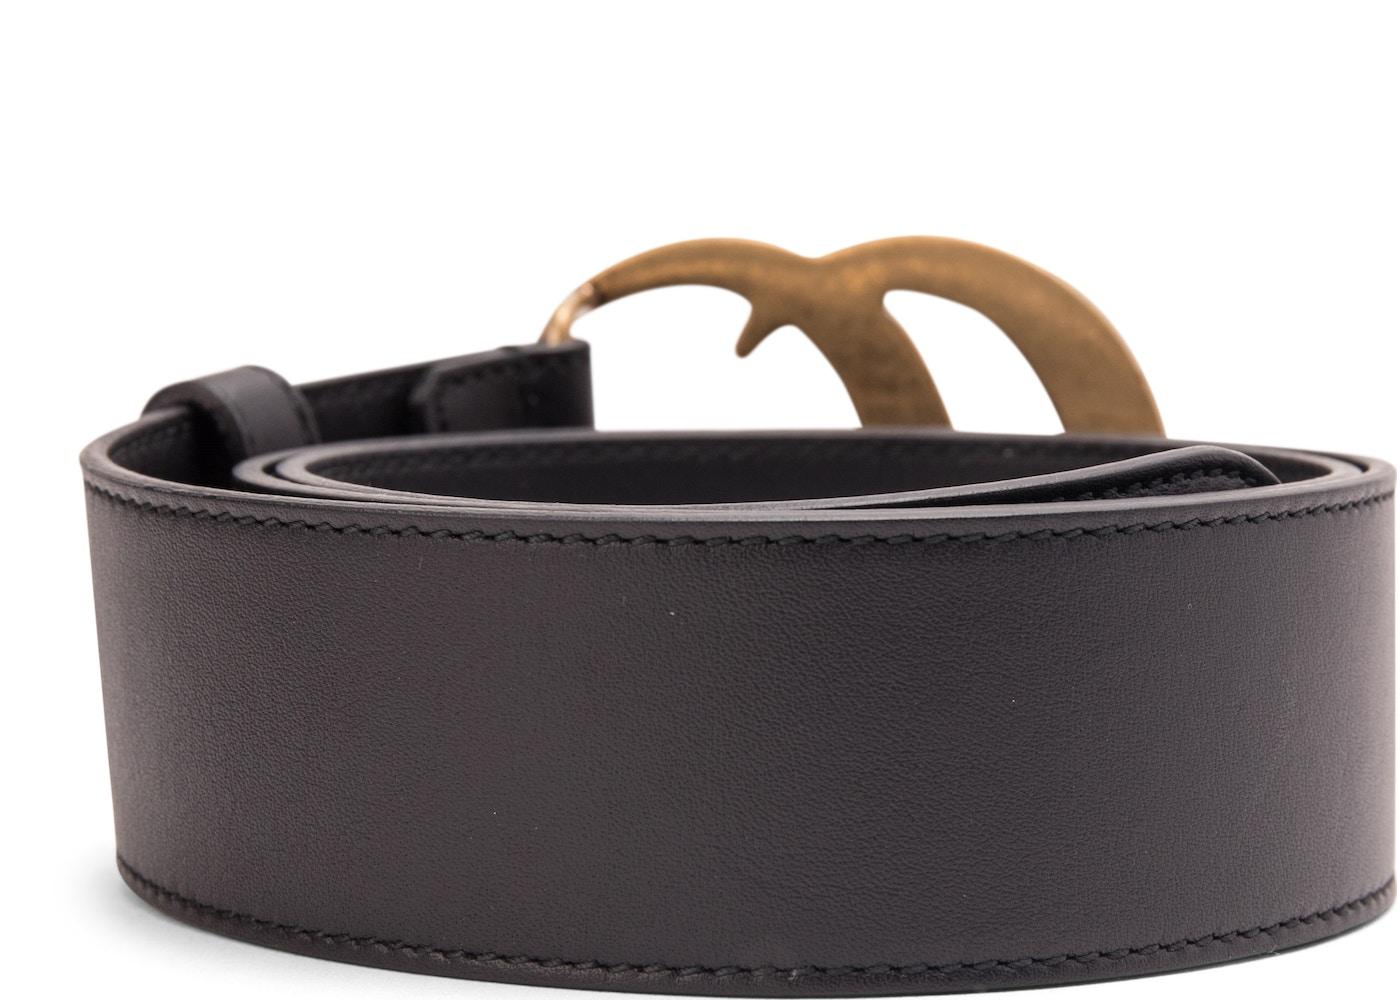 23a0bd5e1fc6a Gucci Double G Buckle Leather Belt 1.5 Width 70-28 Black